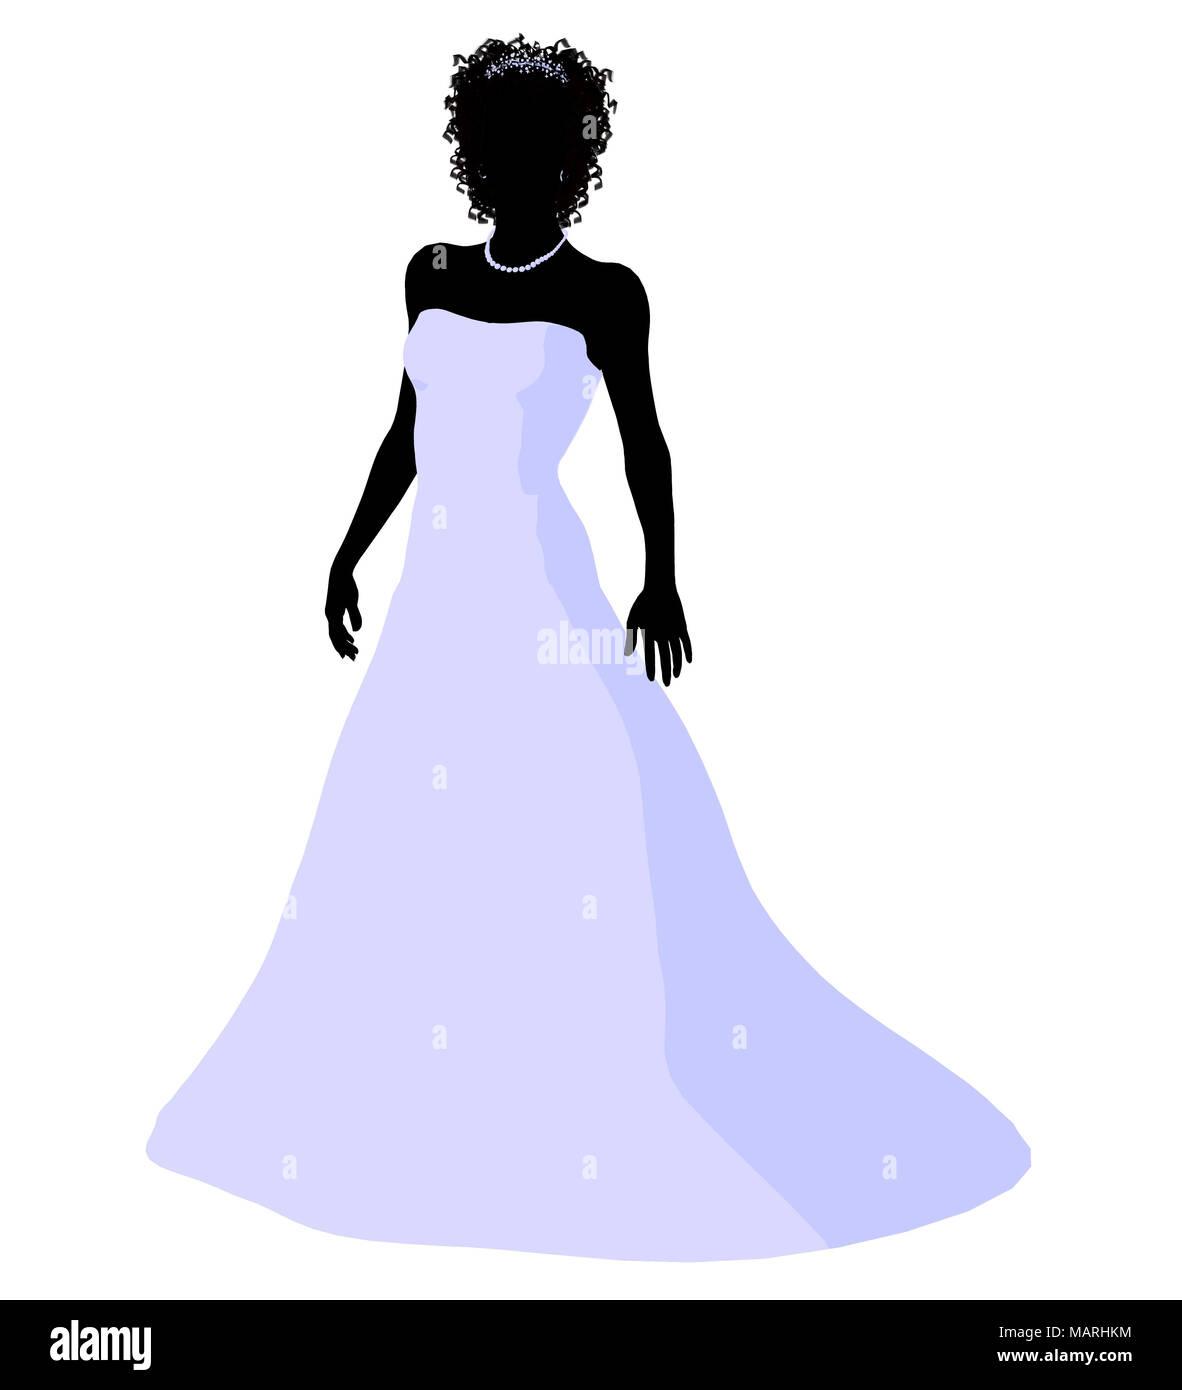 Silhouette Bridal Stockfotos & Silhouette Bridal Bilder - Seite 4 ...